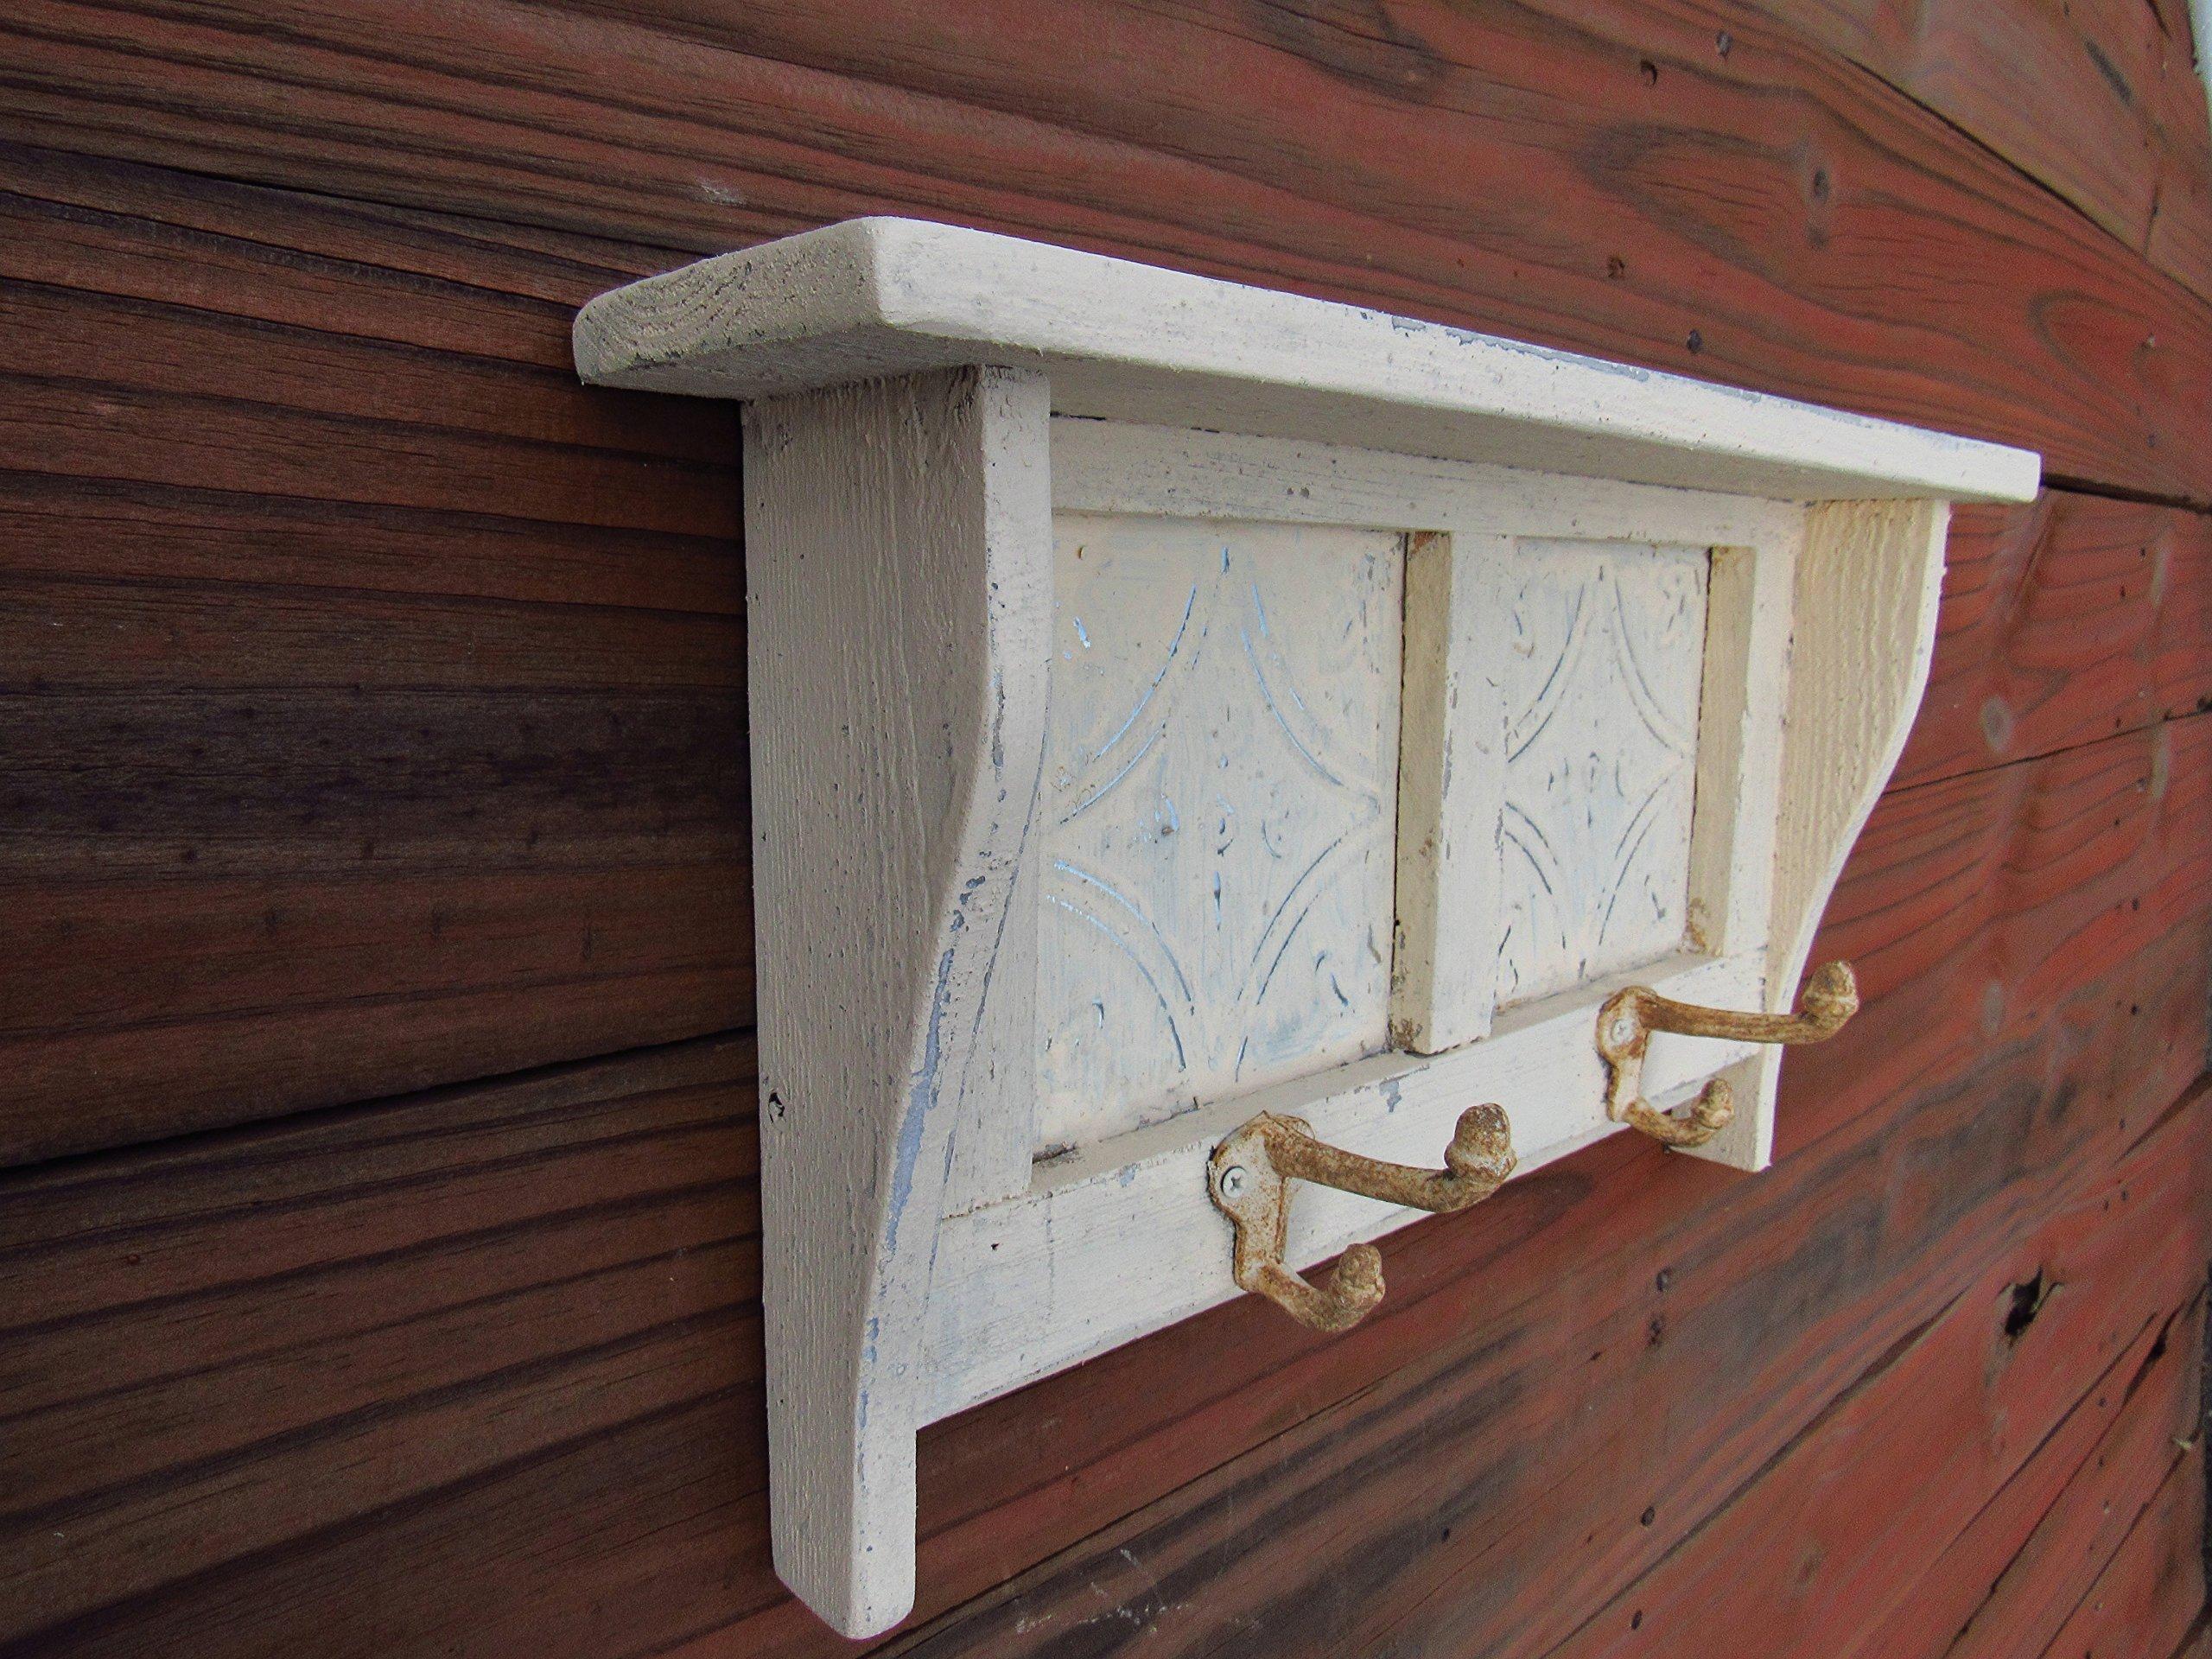 Antique Style Wall shelf Distressed Wall Shelf French Country Cottage Chic Shelf, Kitchen Shelf, glass knob hooks, 18'' long